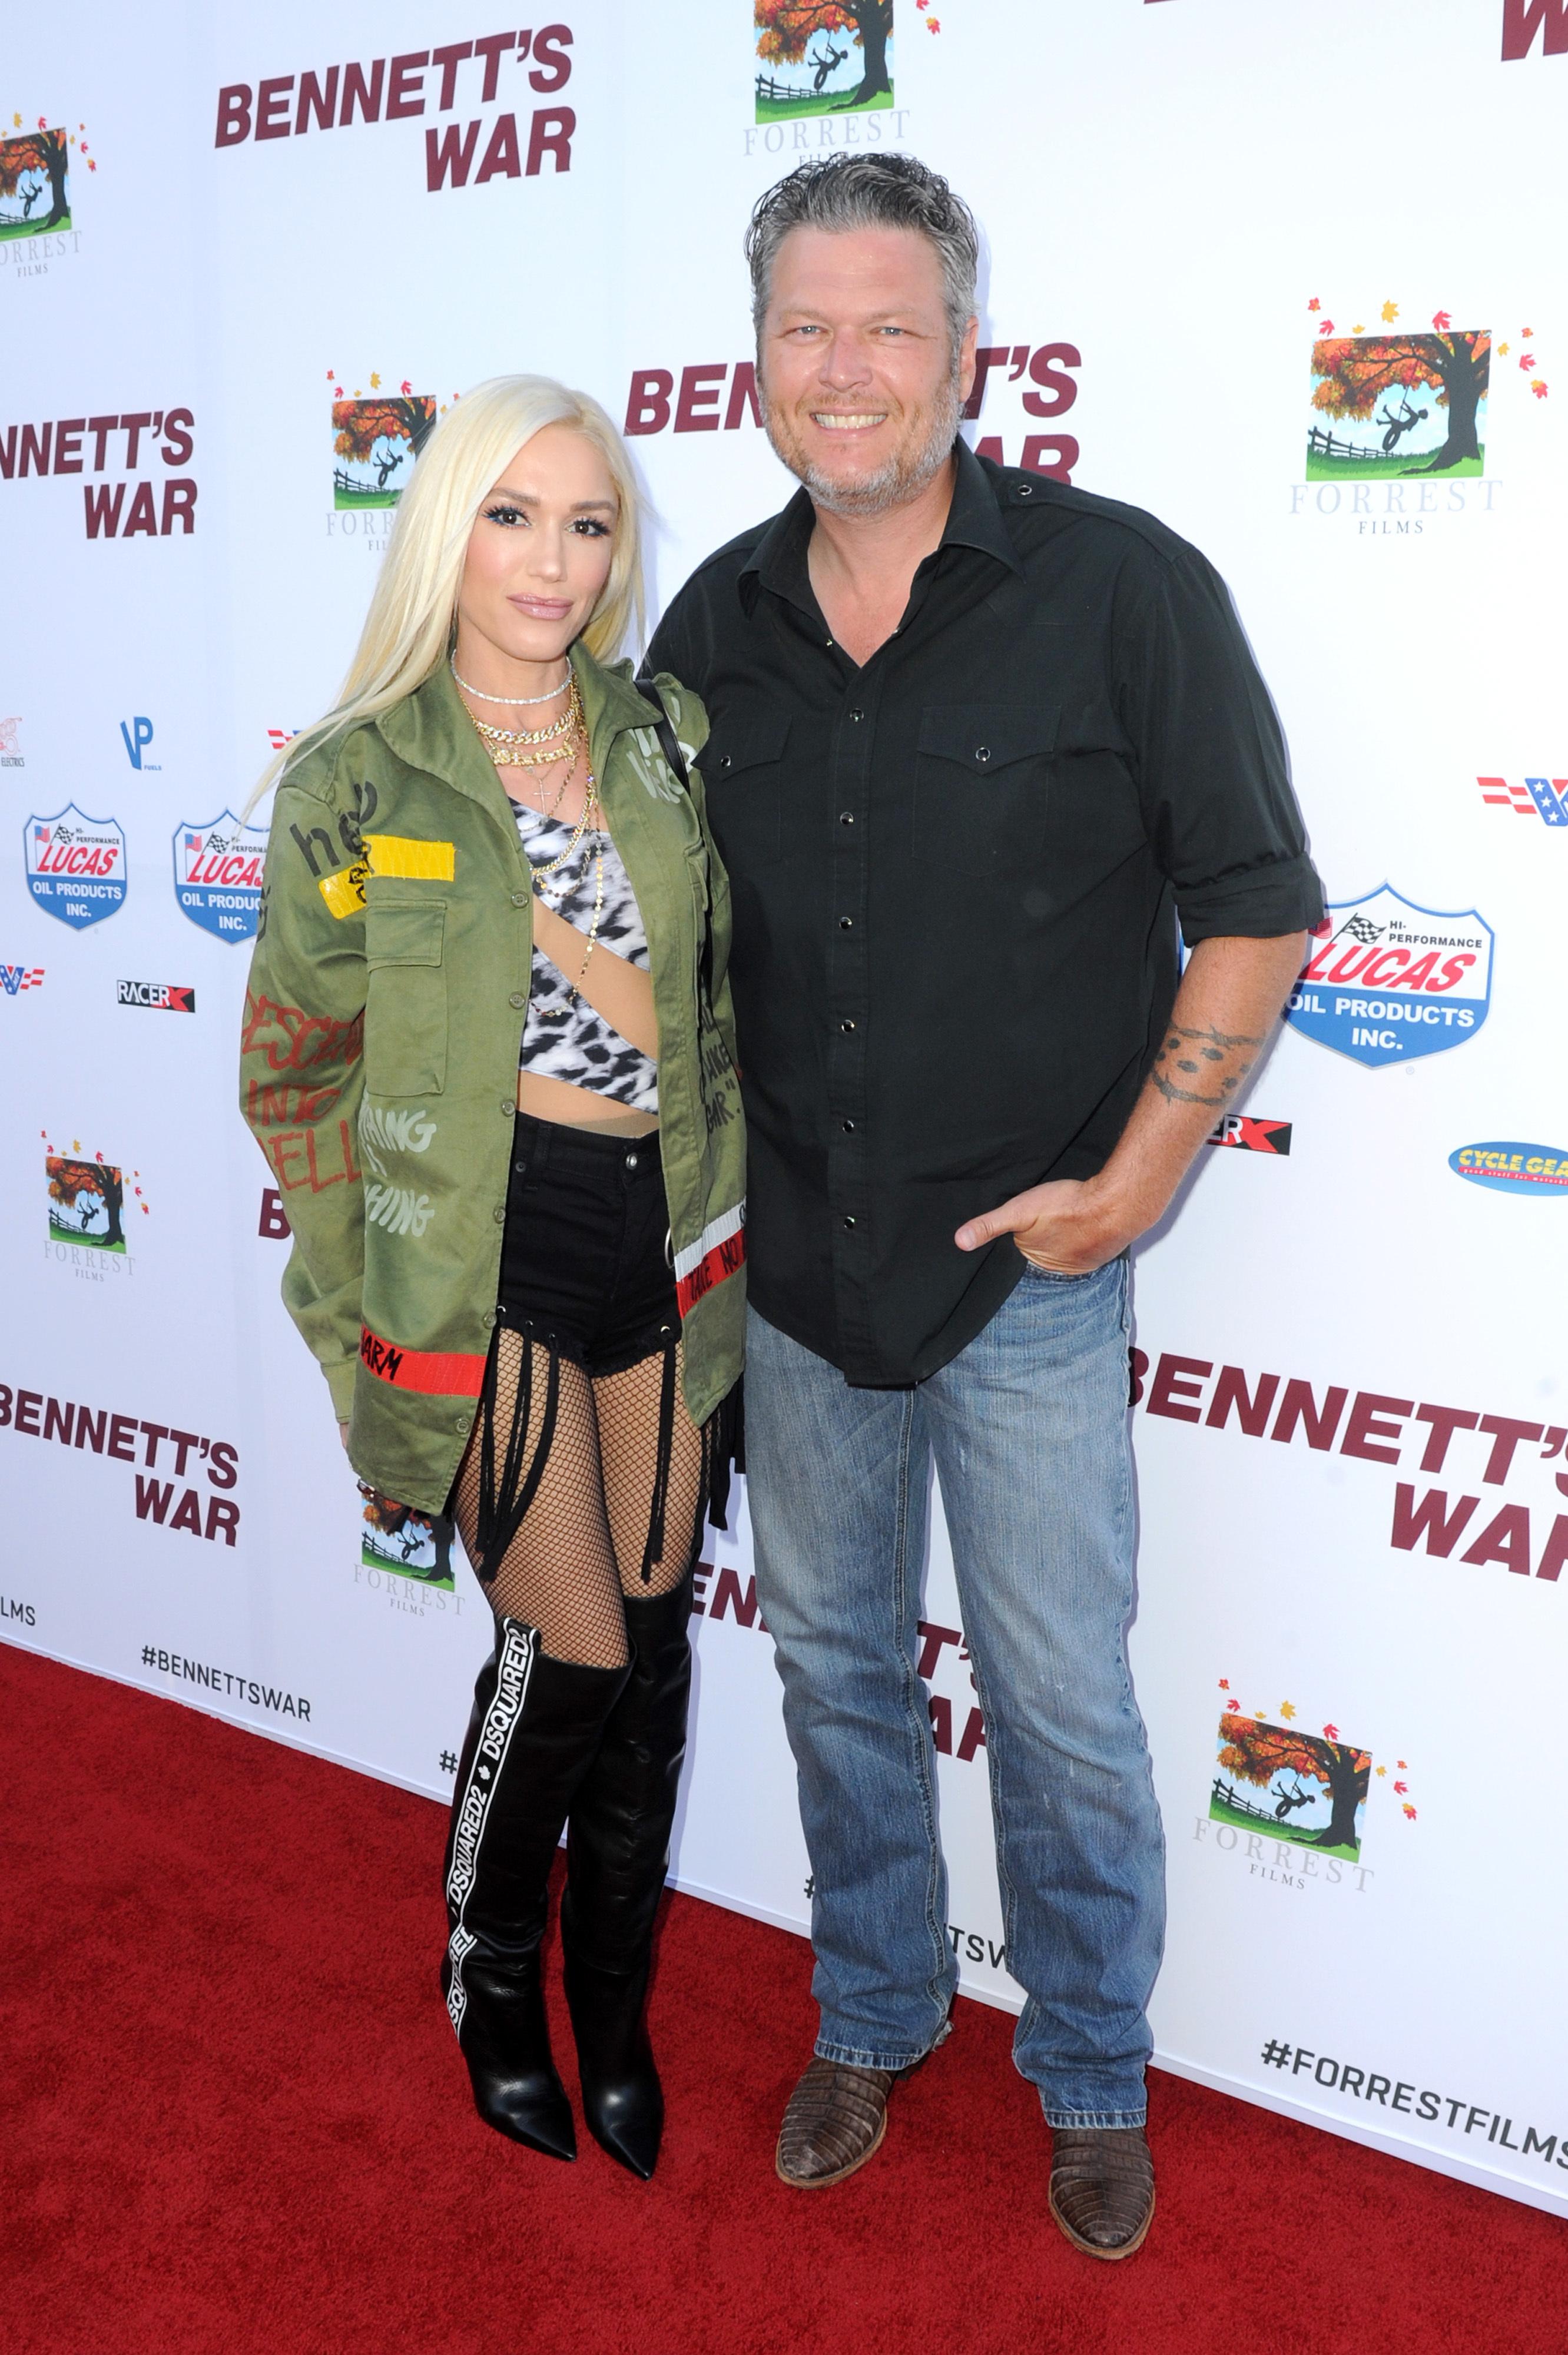 "Gwen Stefani and Blake Shelton arrive at the Los Angeles premiere of ""Bennett's War"" at Warner Bros. Studios in Burbank, California, on August 13, 2019."